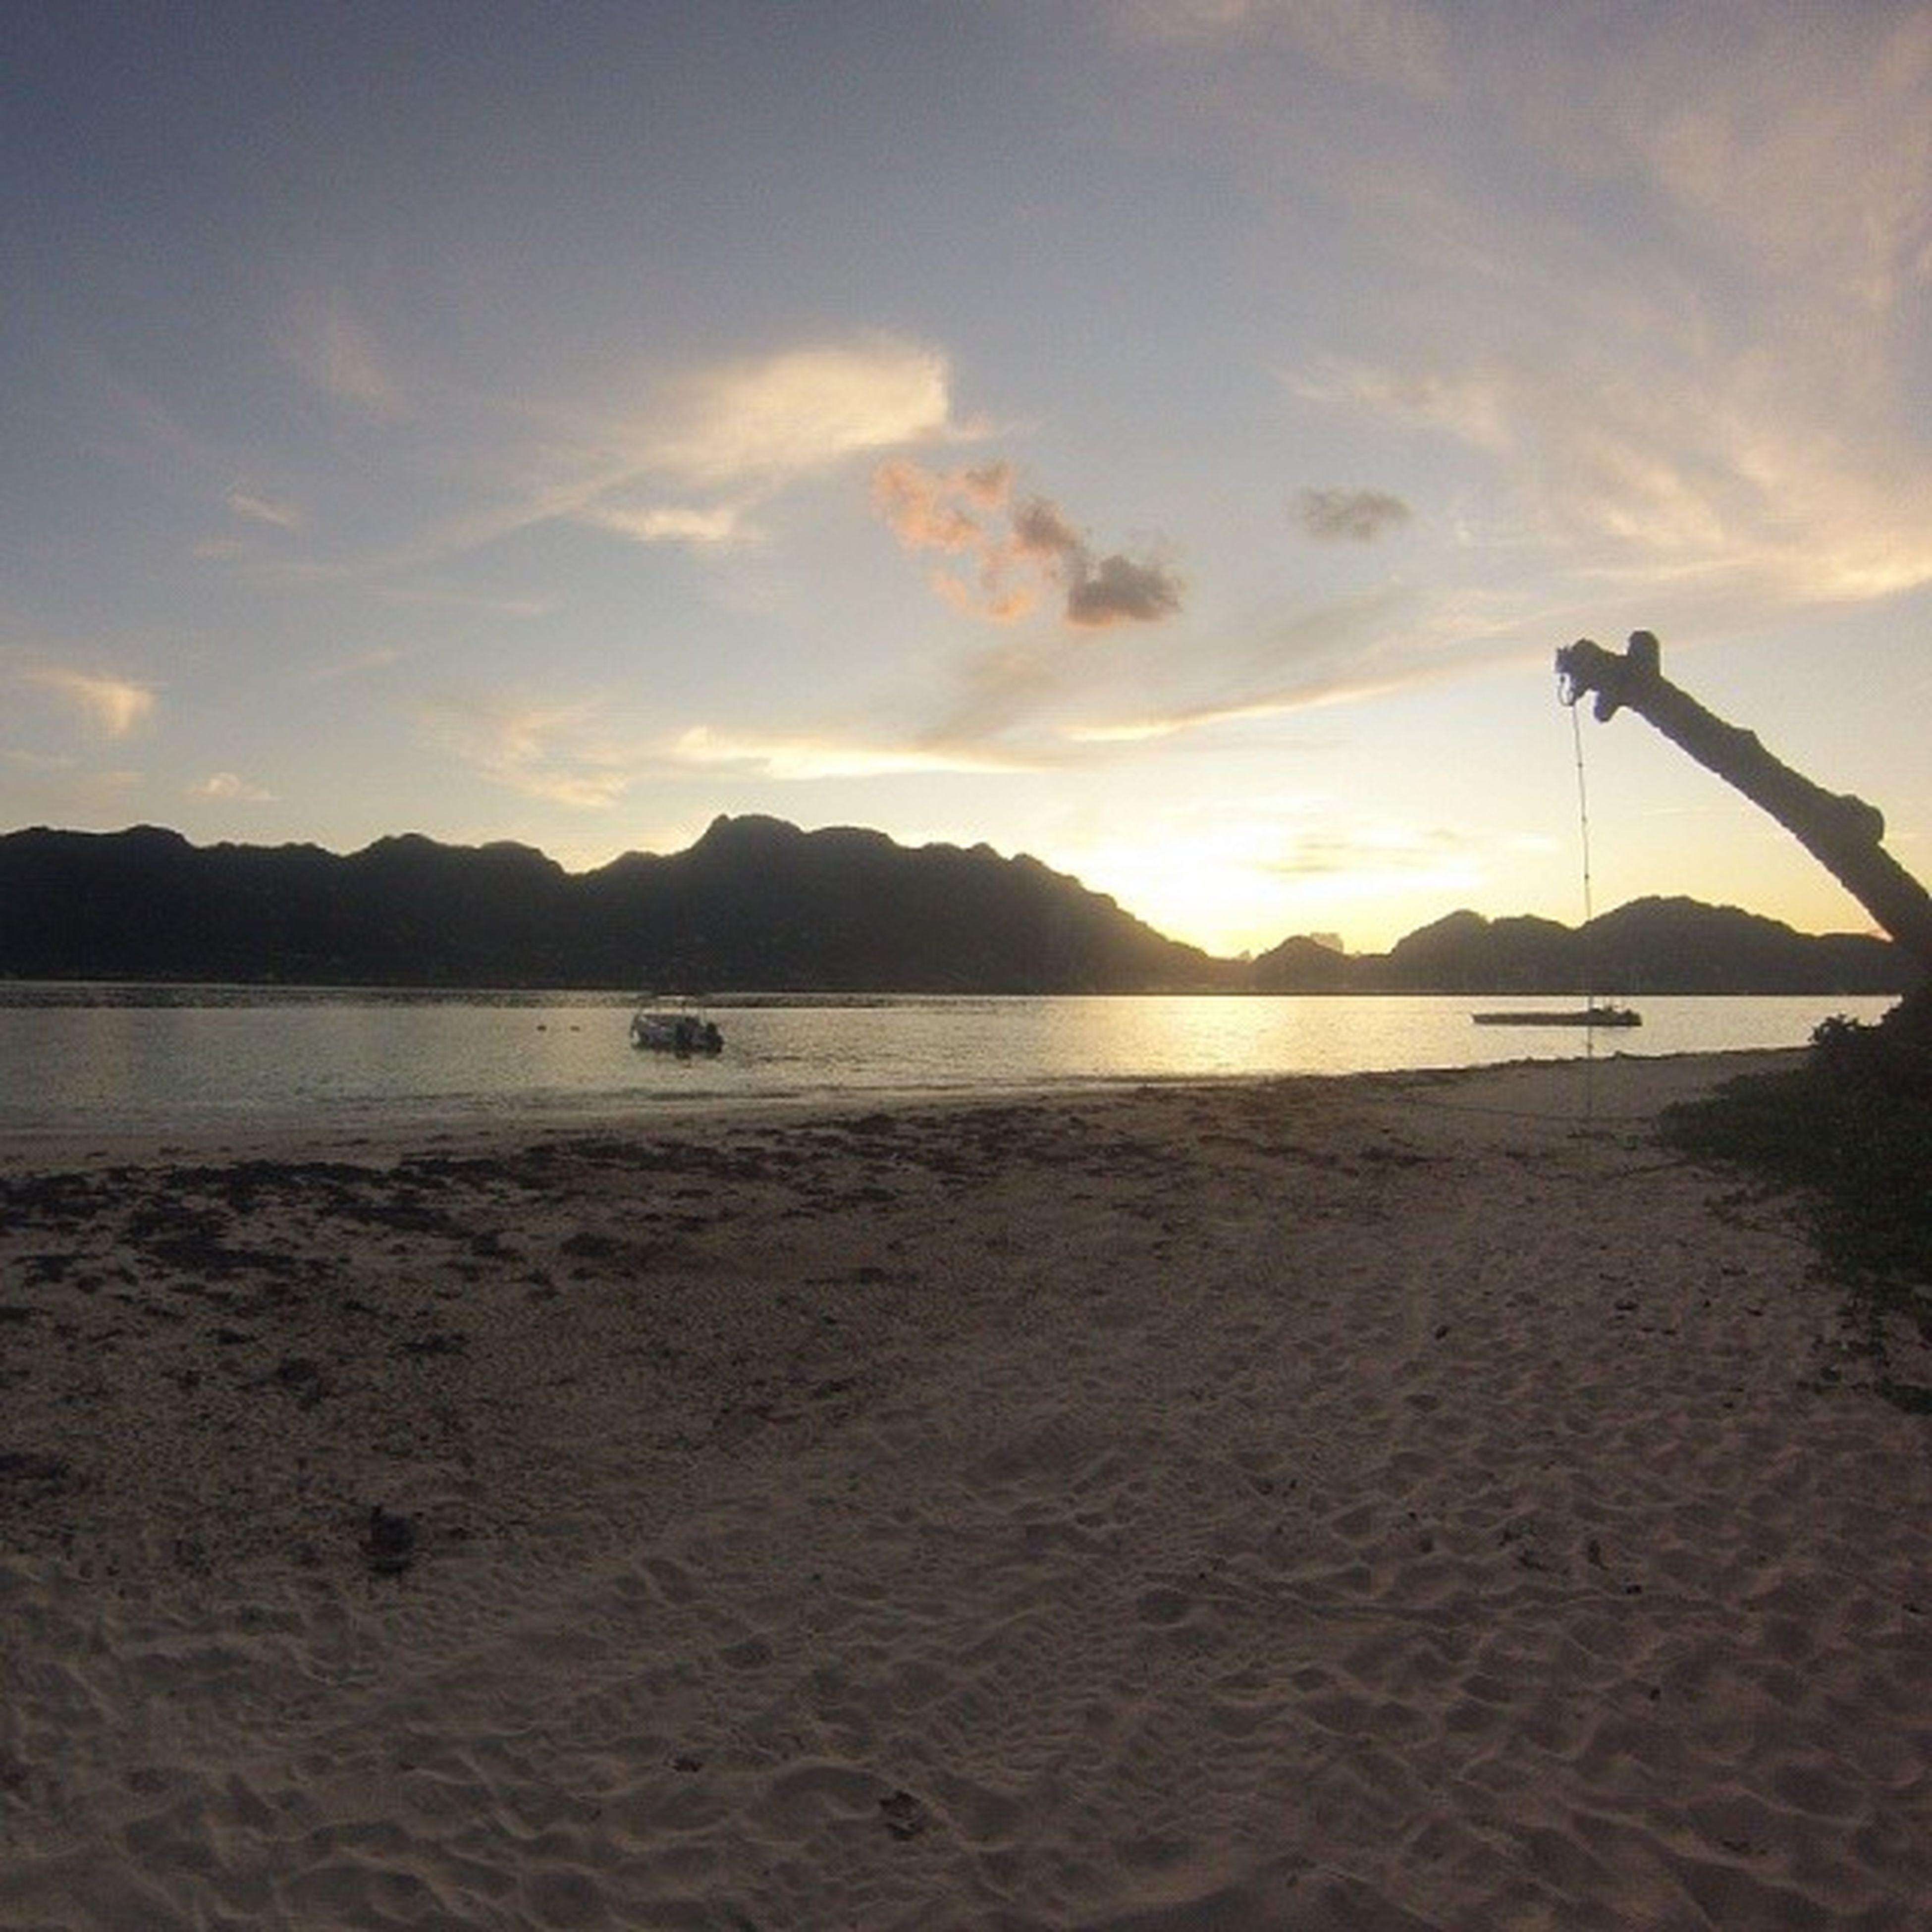 sunset, water, sky, tranquil scene, scenics, tranquility, beauty in nature, sea, mountain, beach, silhouette, sun, nature, idyllic, cloud - sky, shore, orange color, sunlight, cloud, lake